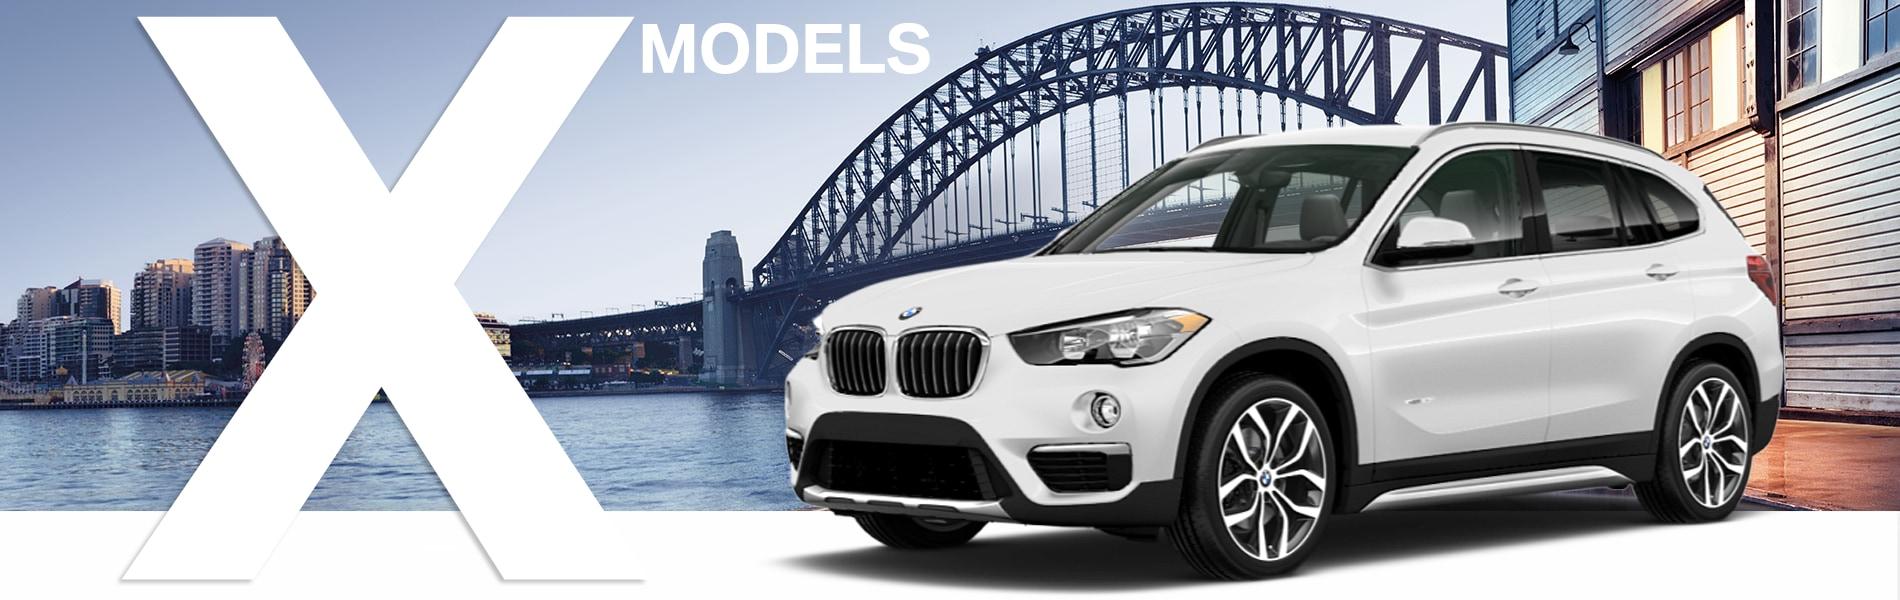 BMW X Model In Richmond VA - 2016 bmw models